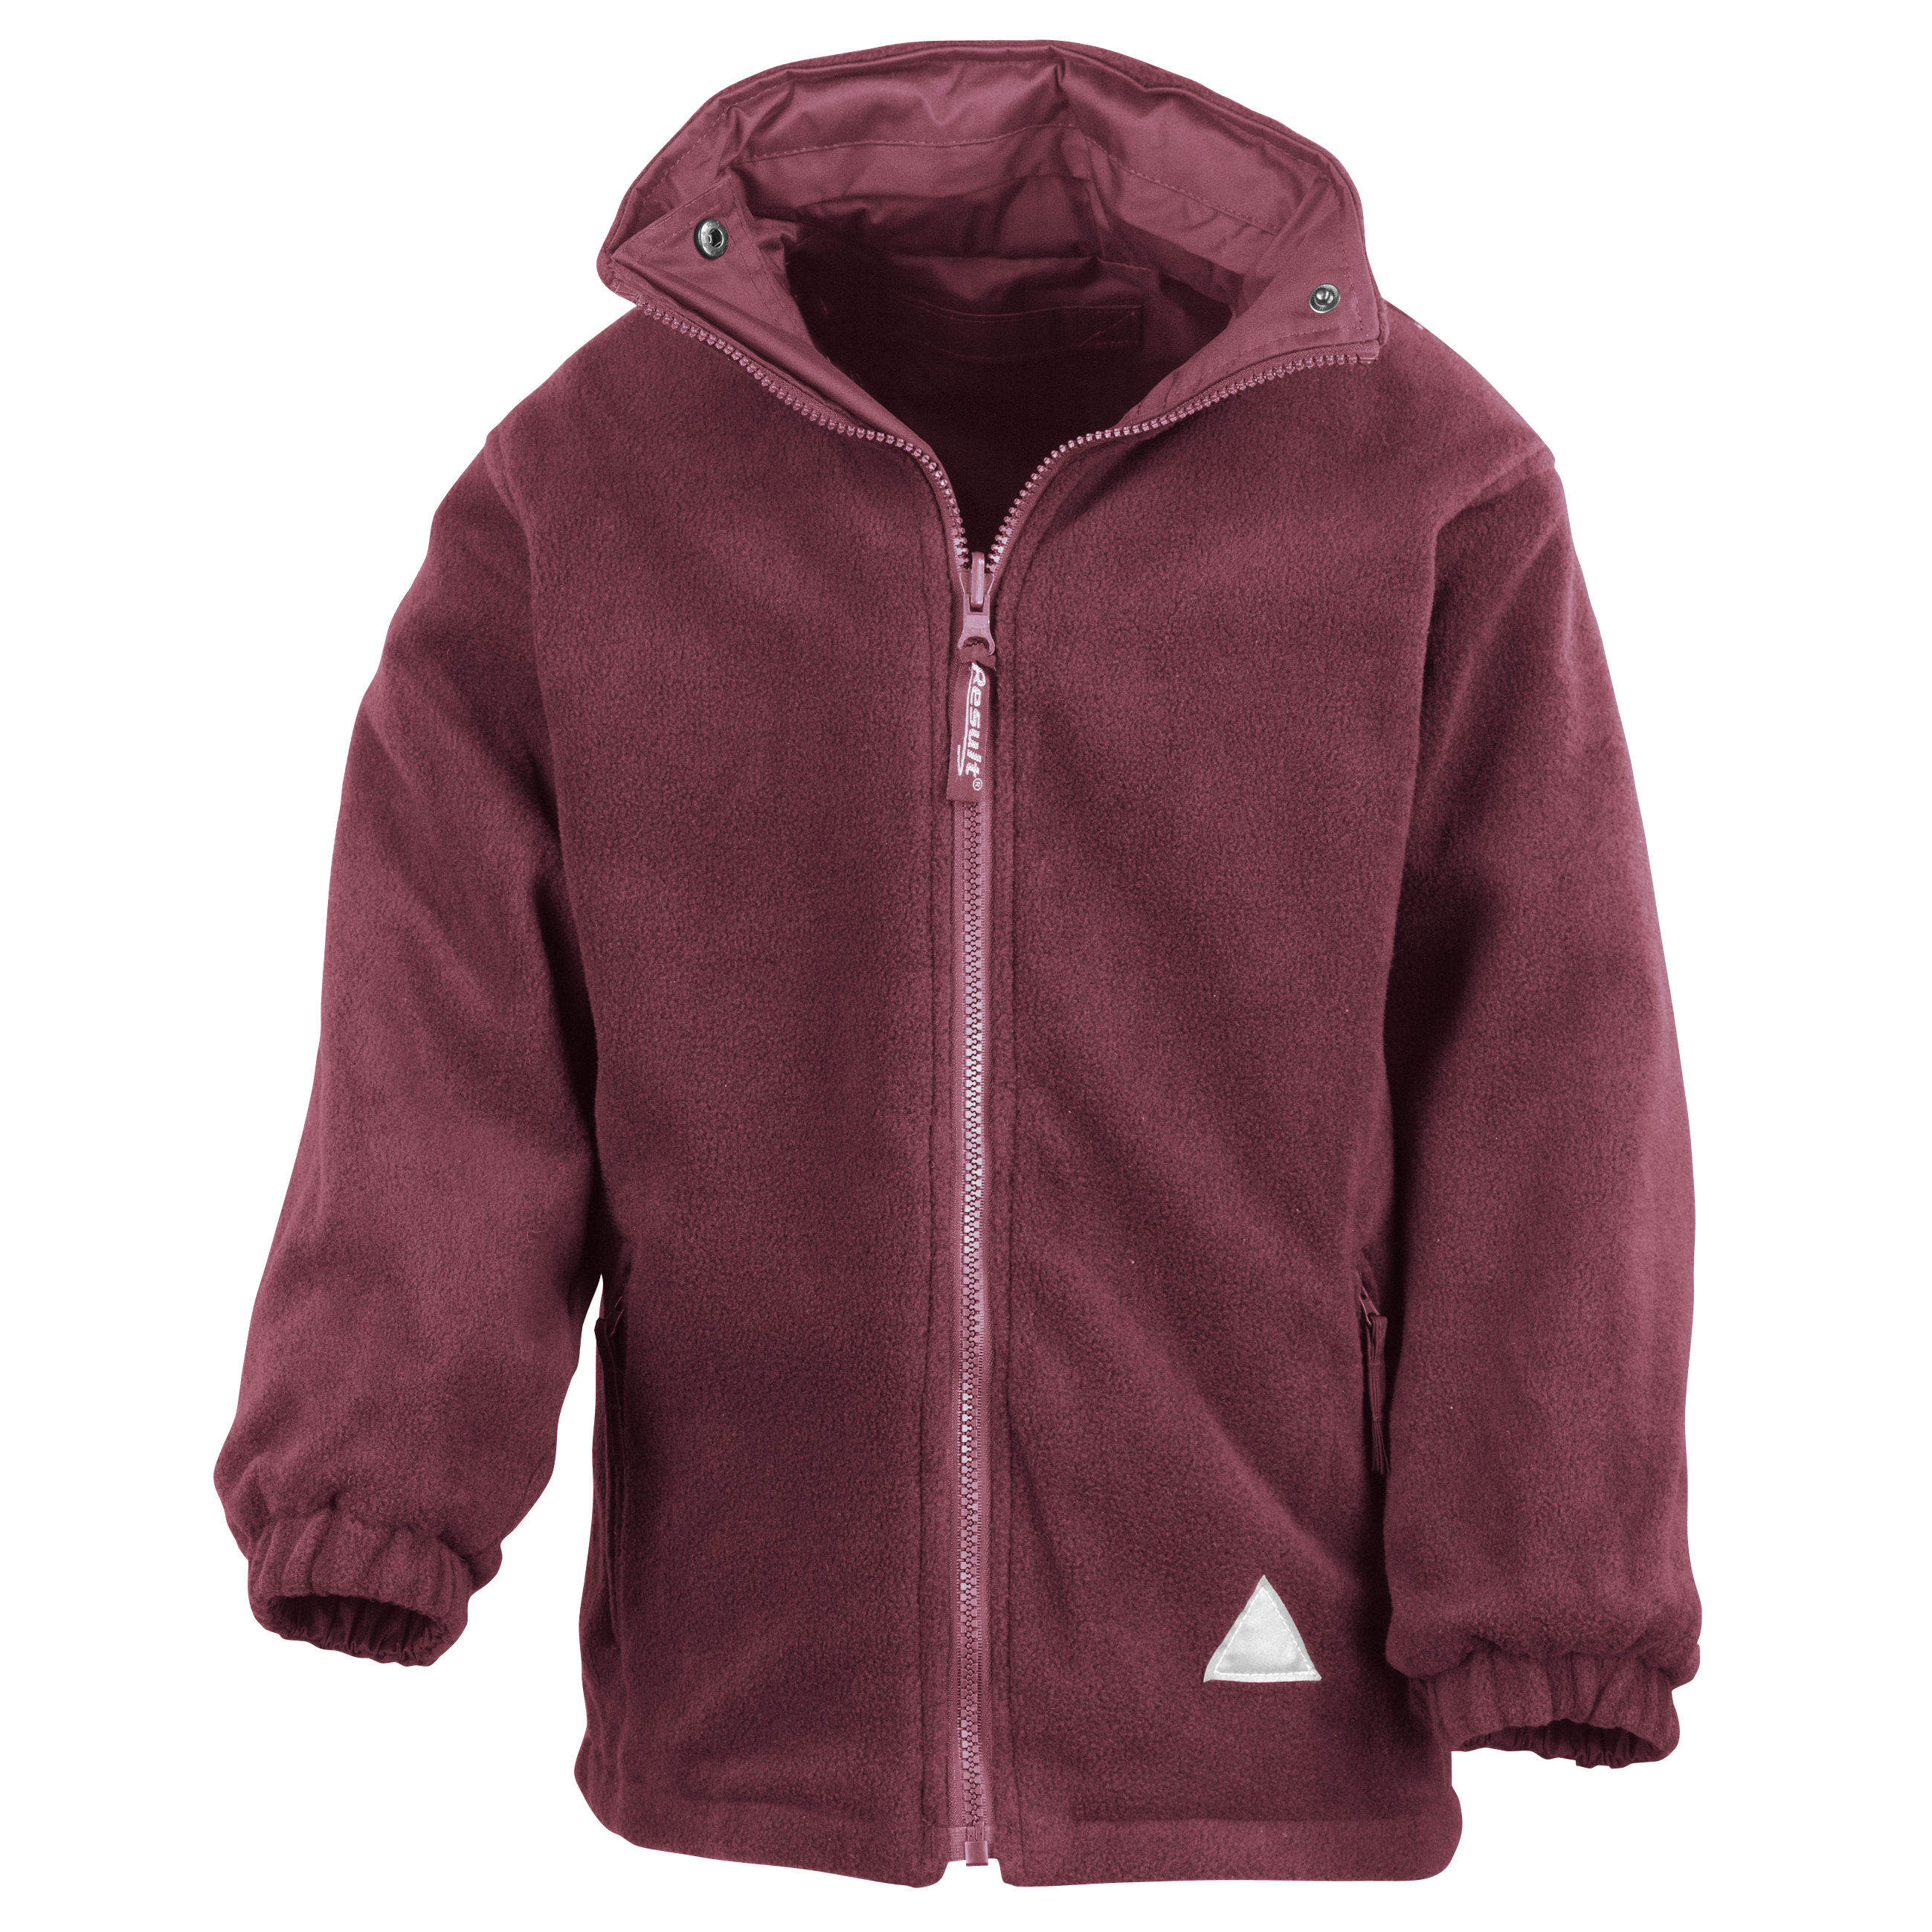 Result Childrens/Kids Reversible Storm Stuff Anti Pilling Fleece Waterproof Jacket (7/8) (Burgundy/Burgundy)